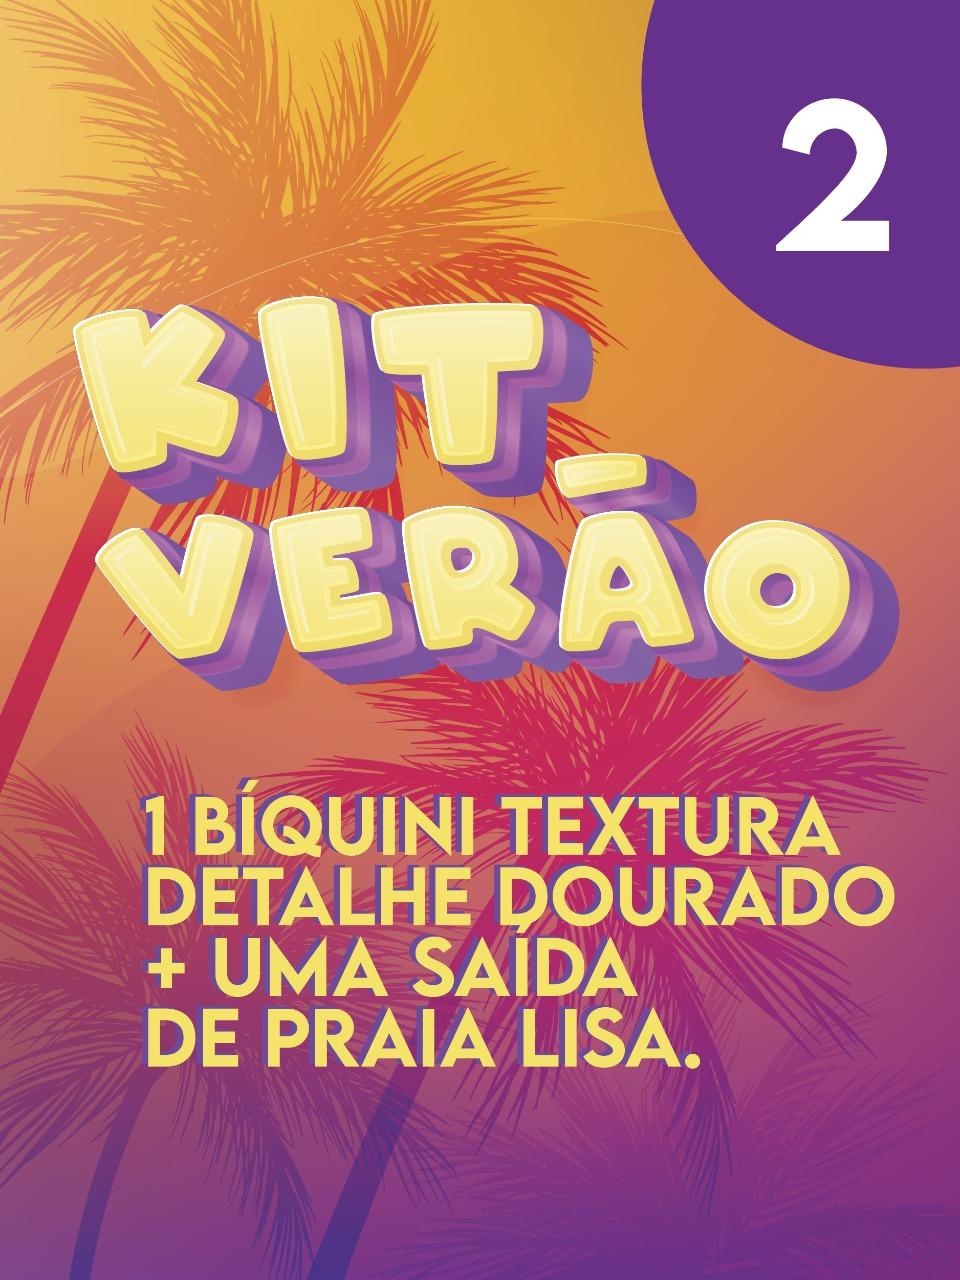 Kit Verão Stilus ♥  (2)